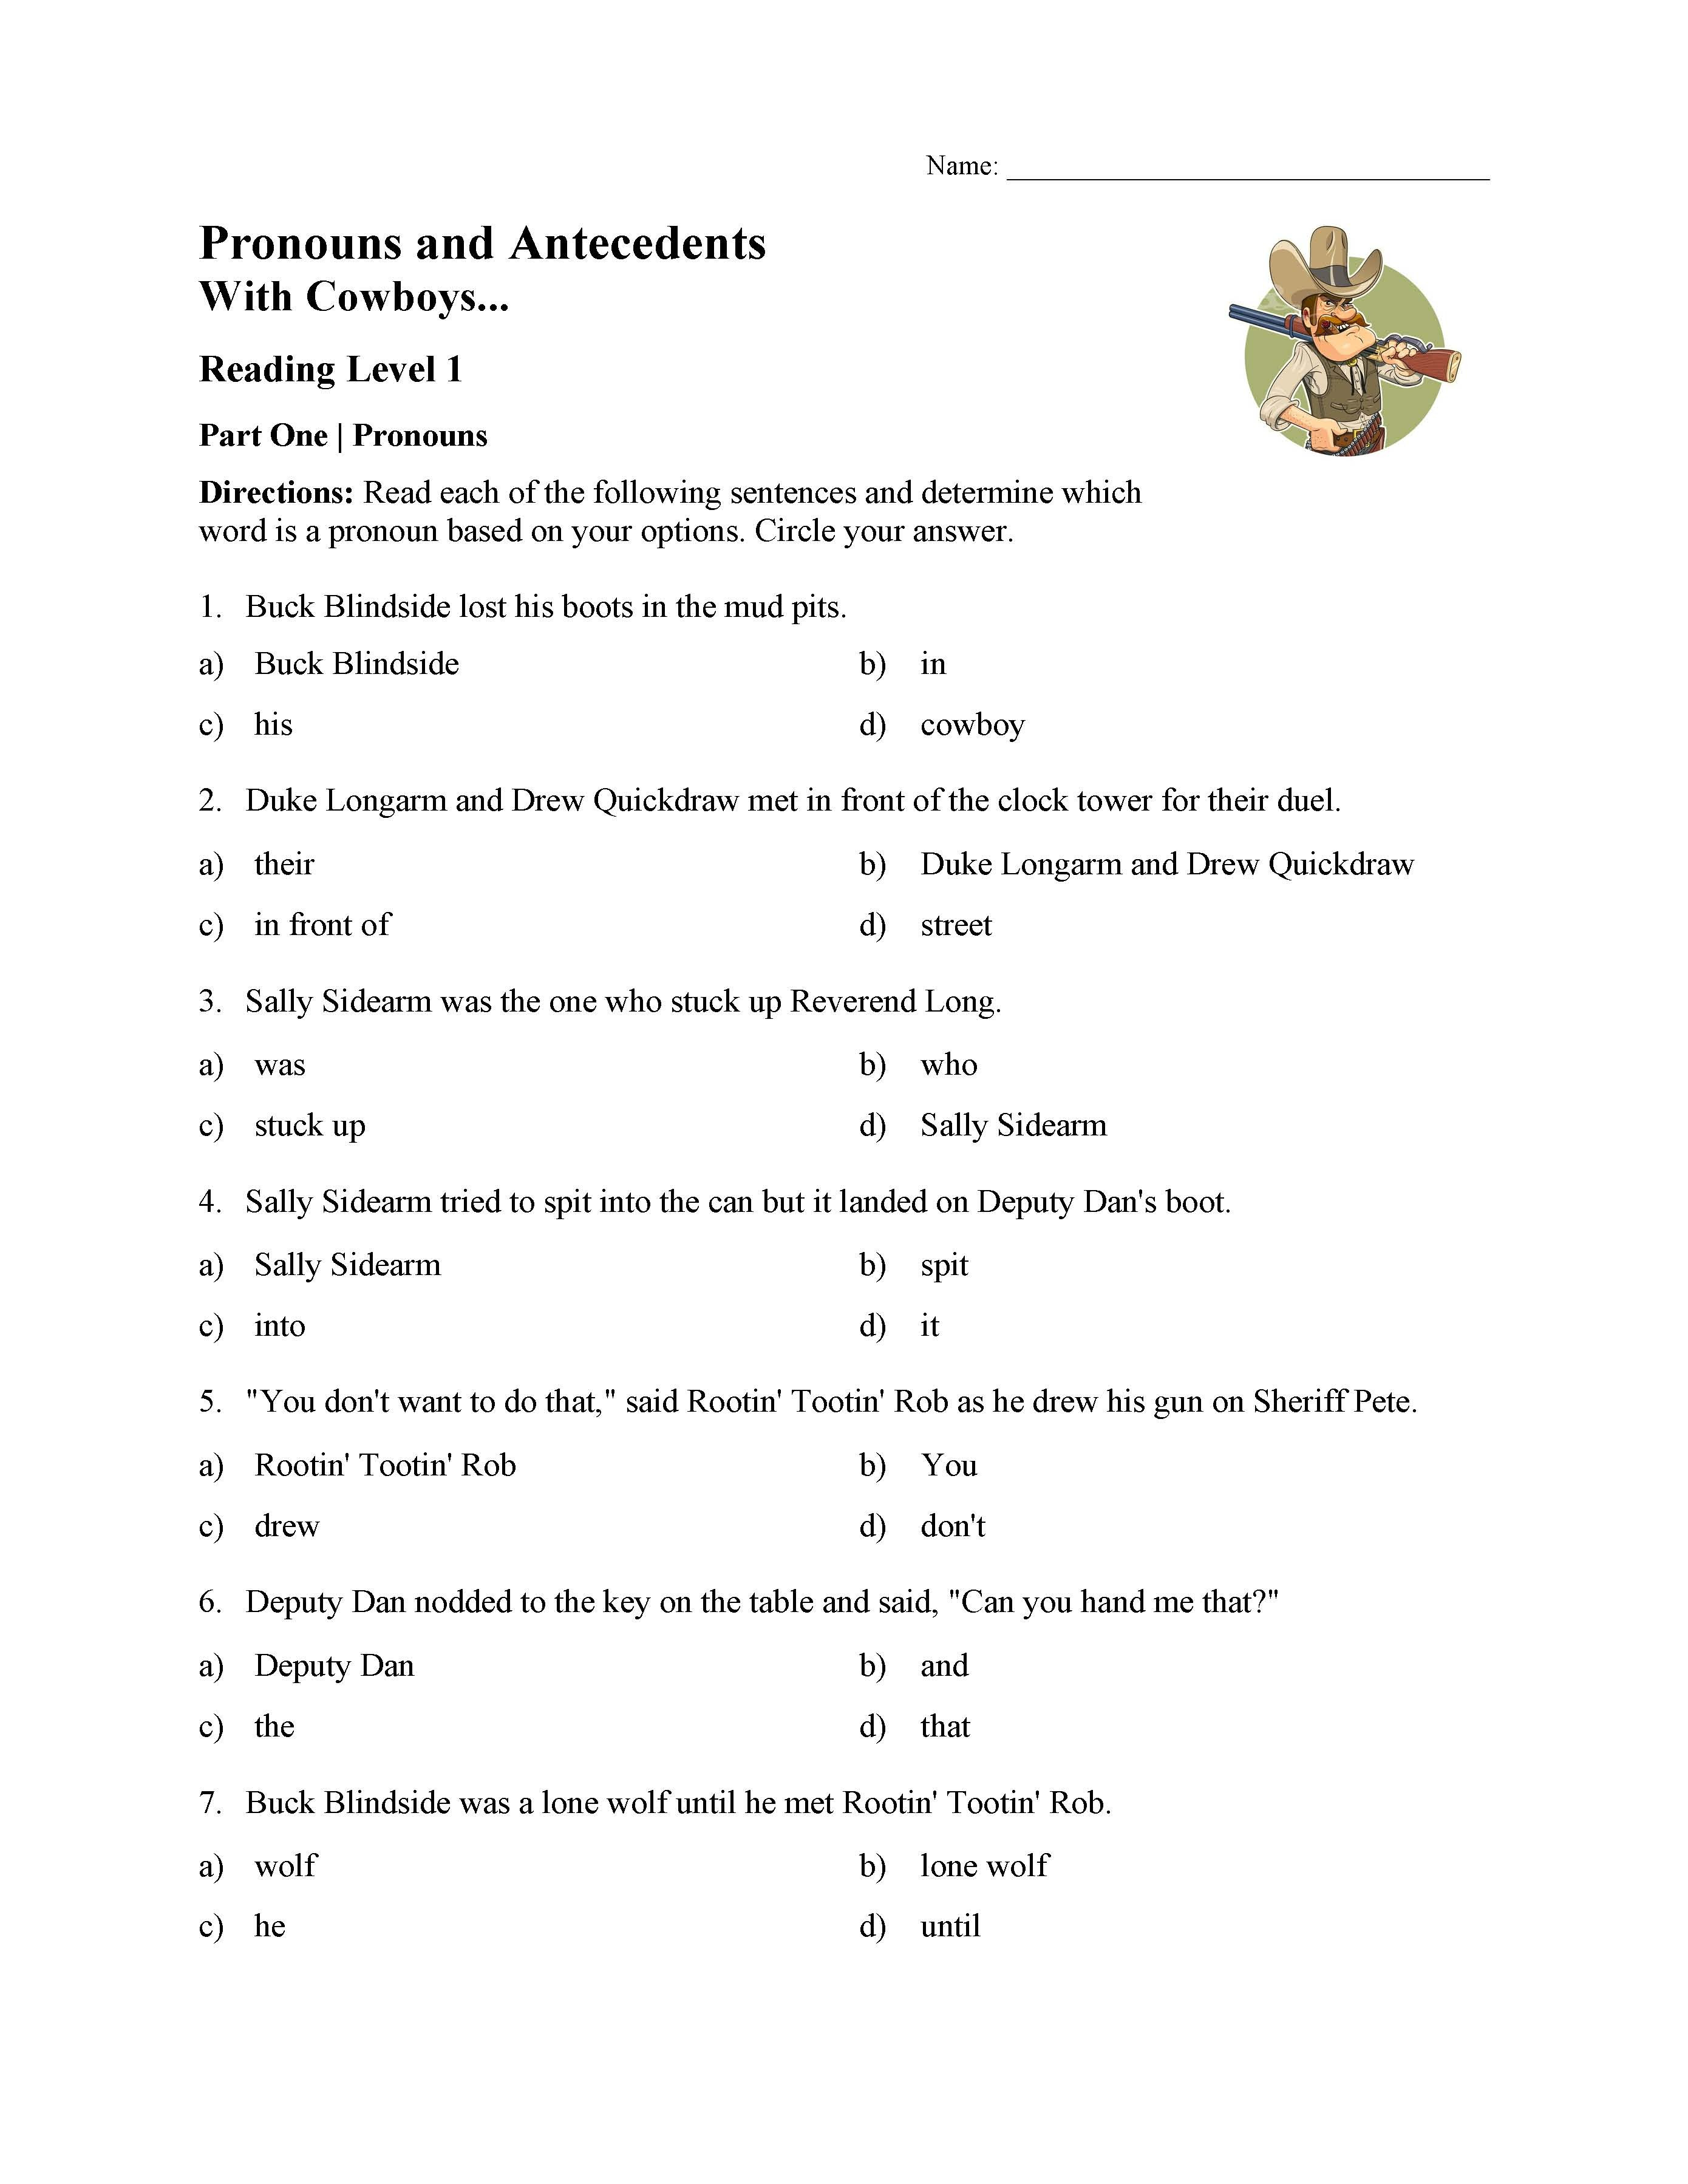 Pronoun Worksheets 5th Grade Pronoun and Antecedent Test with Cowboys